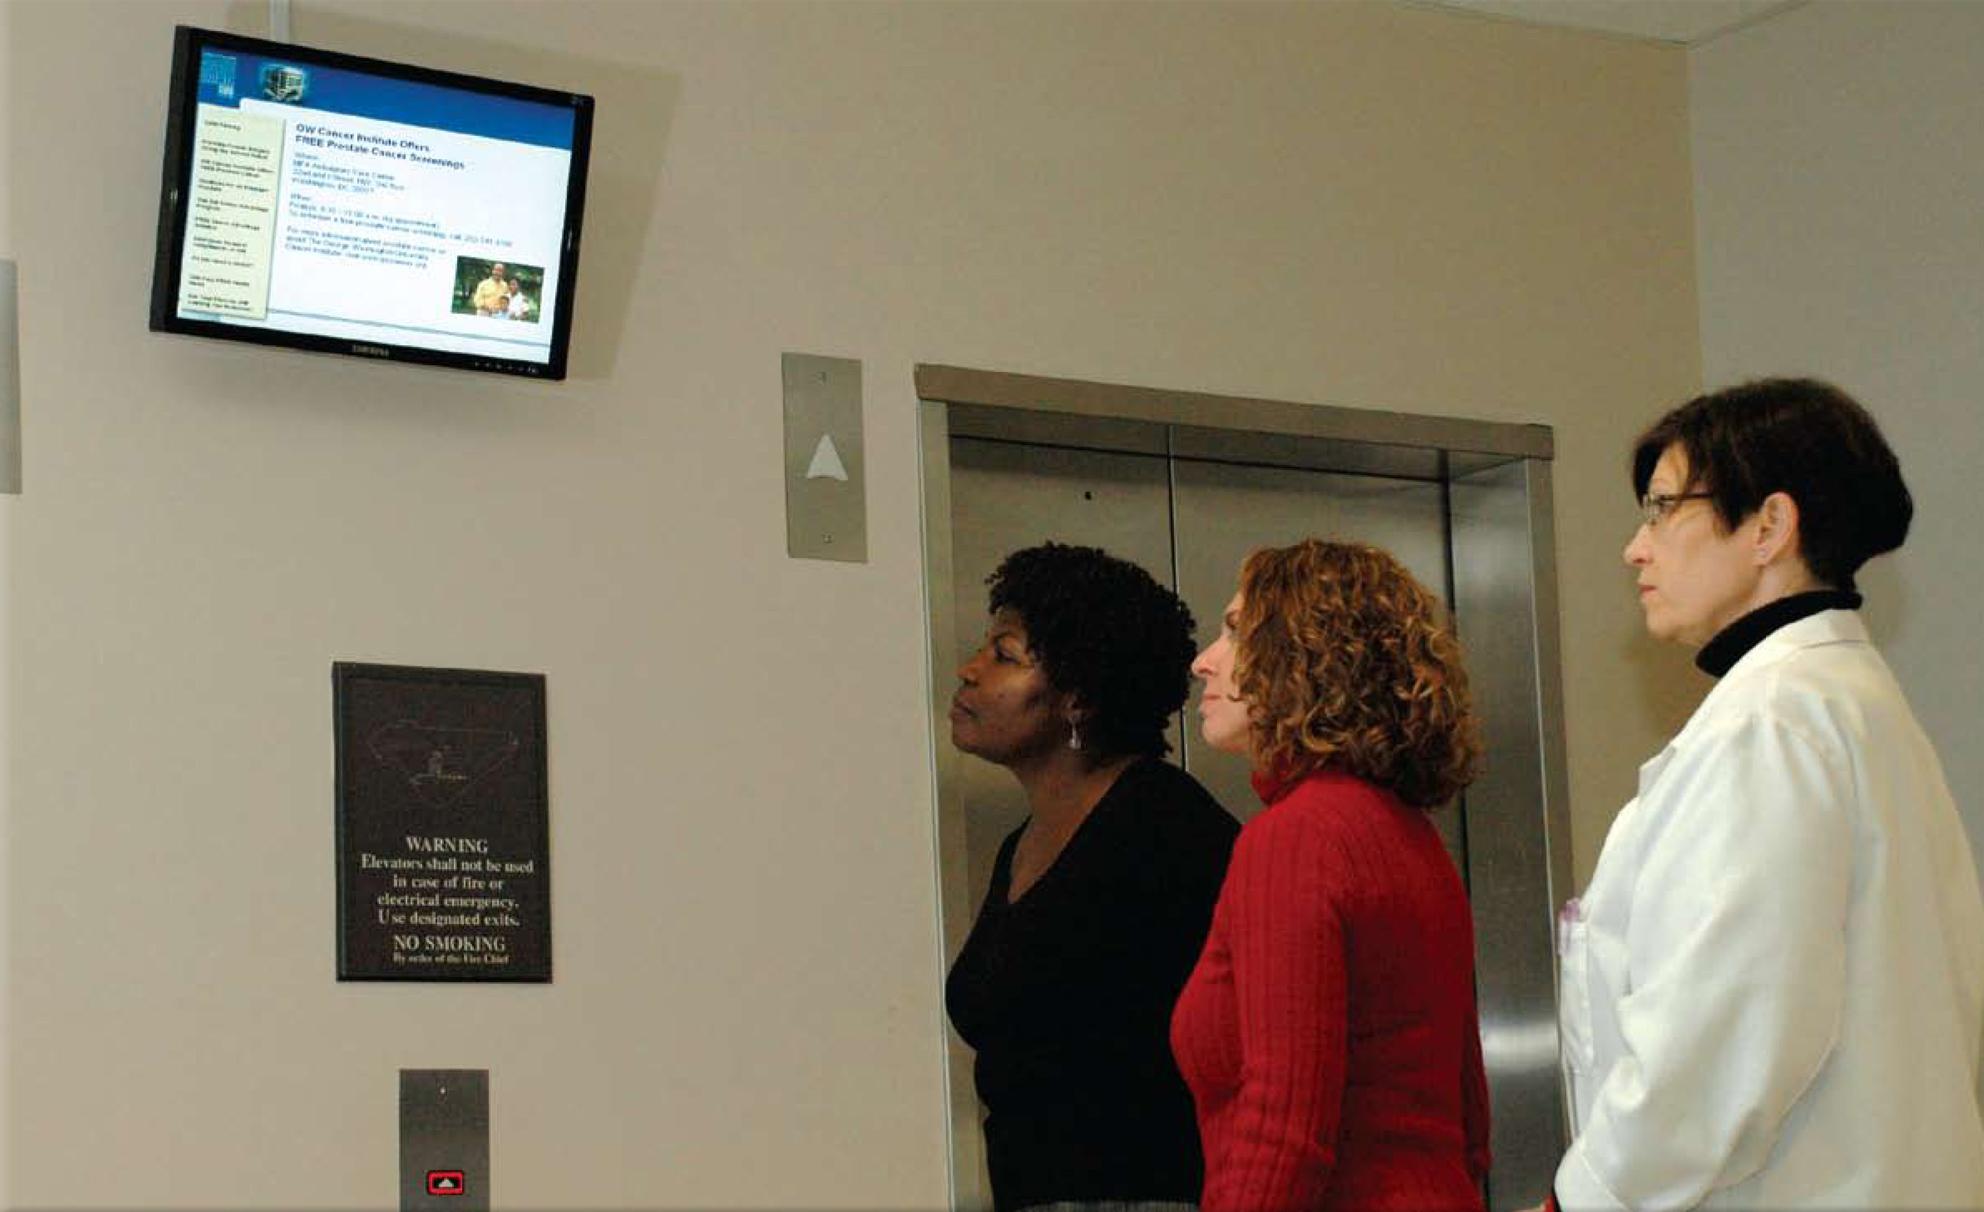 hospital digital signage